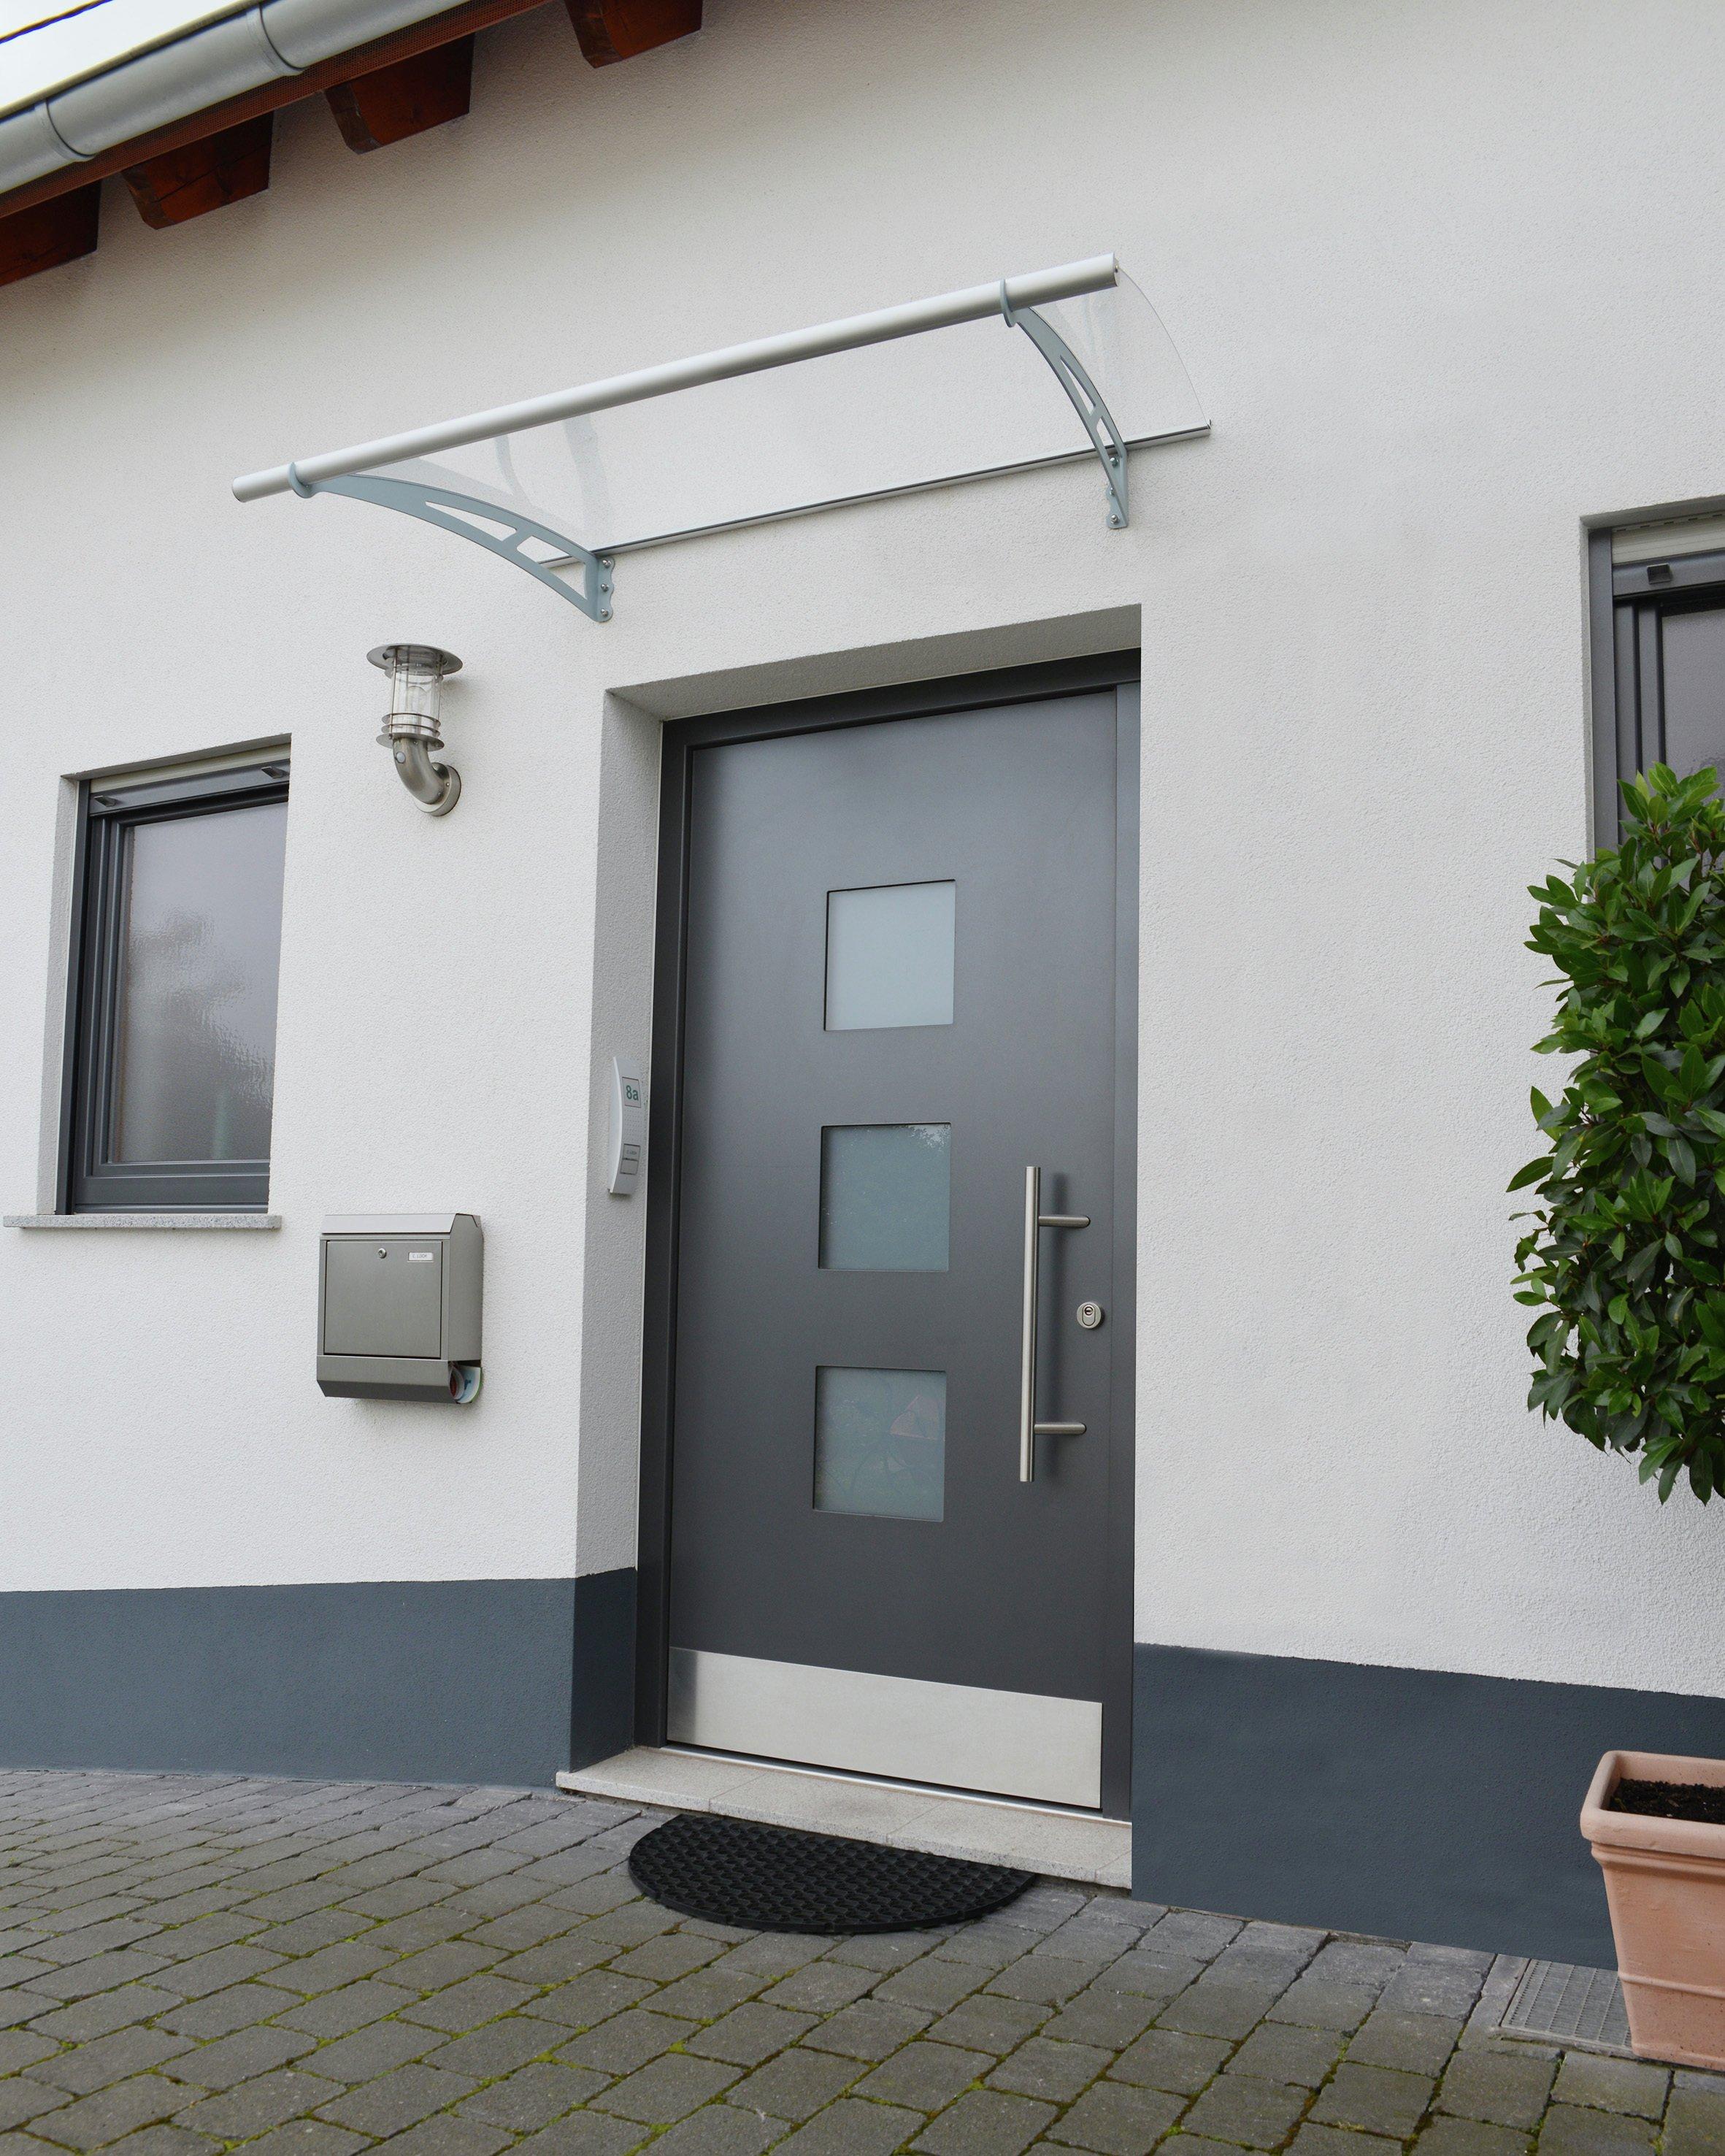 Palram Aquila 1500 Door Canopy. lowest price